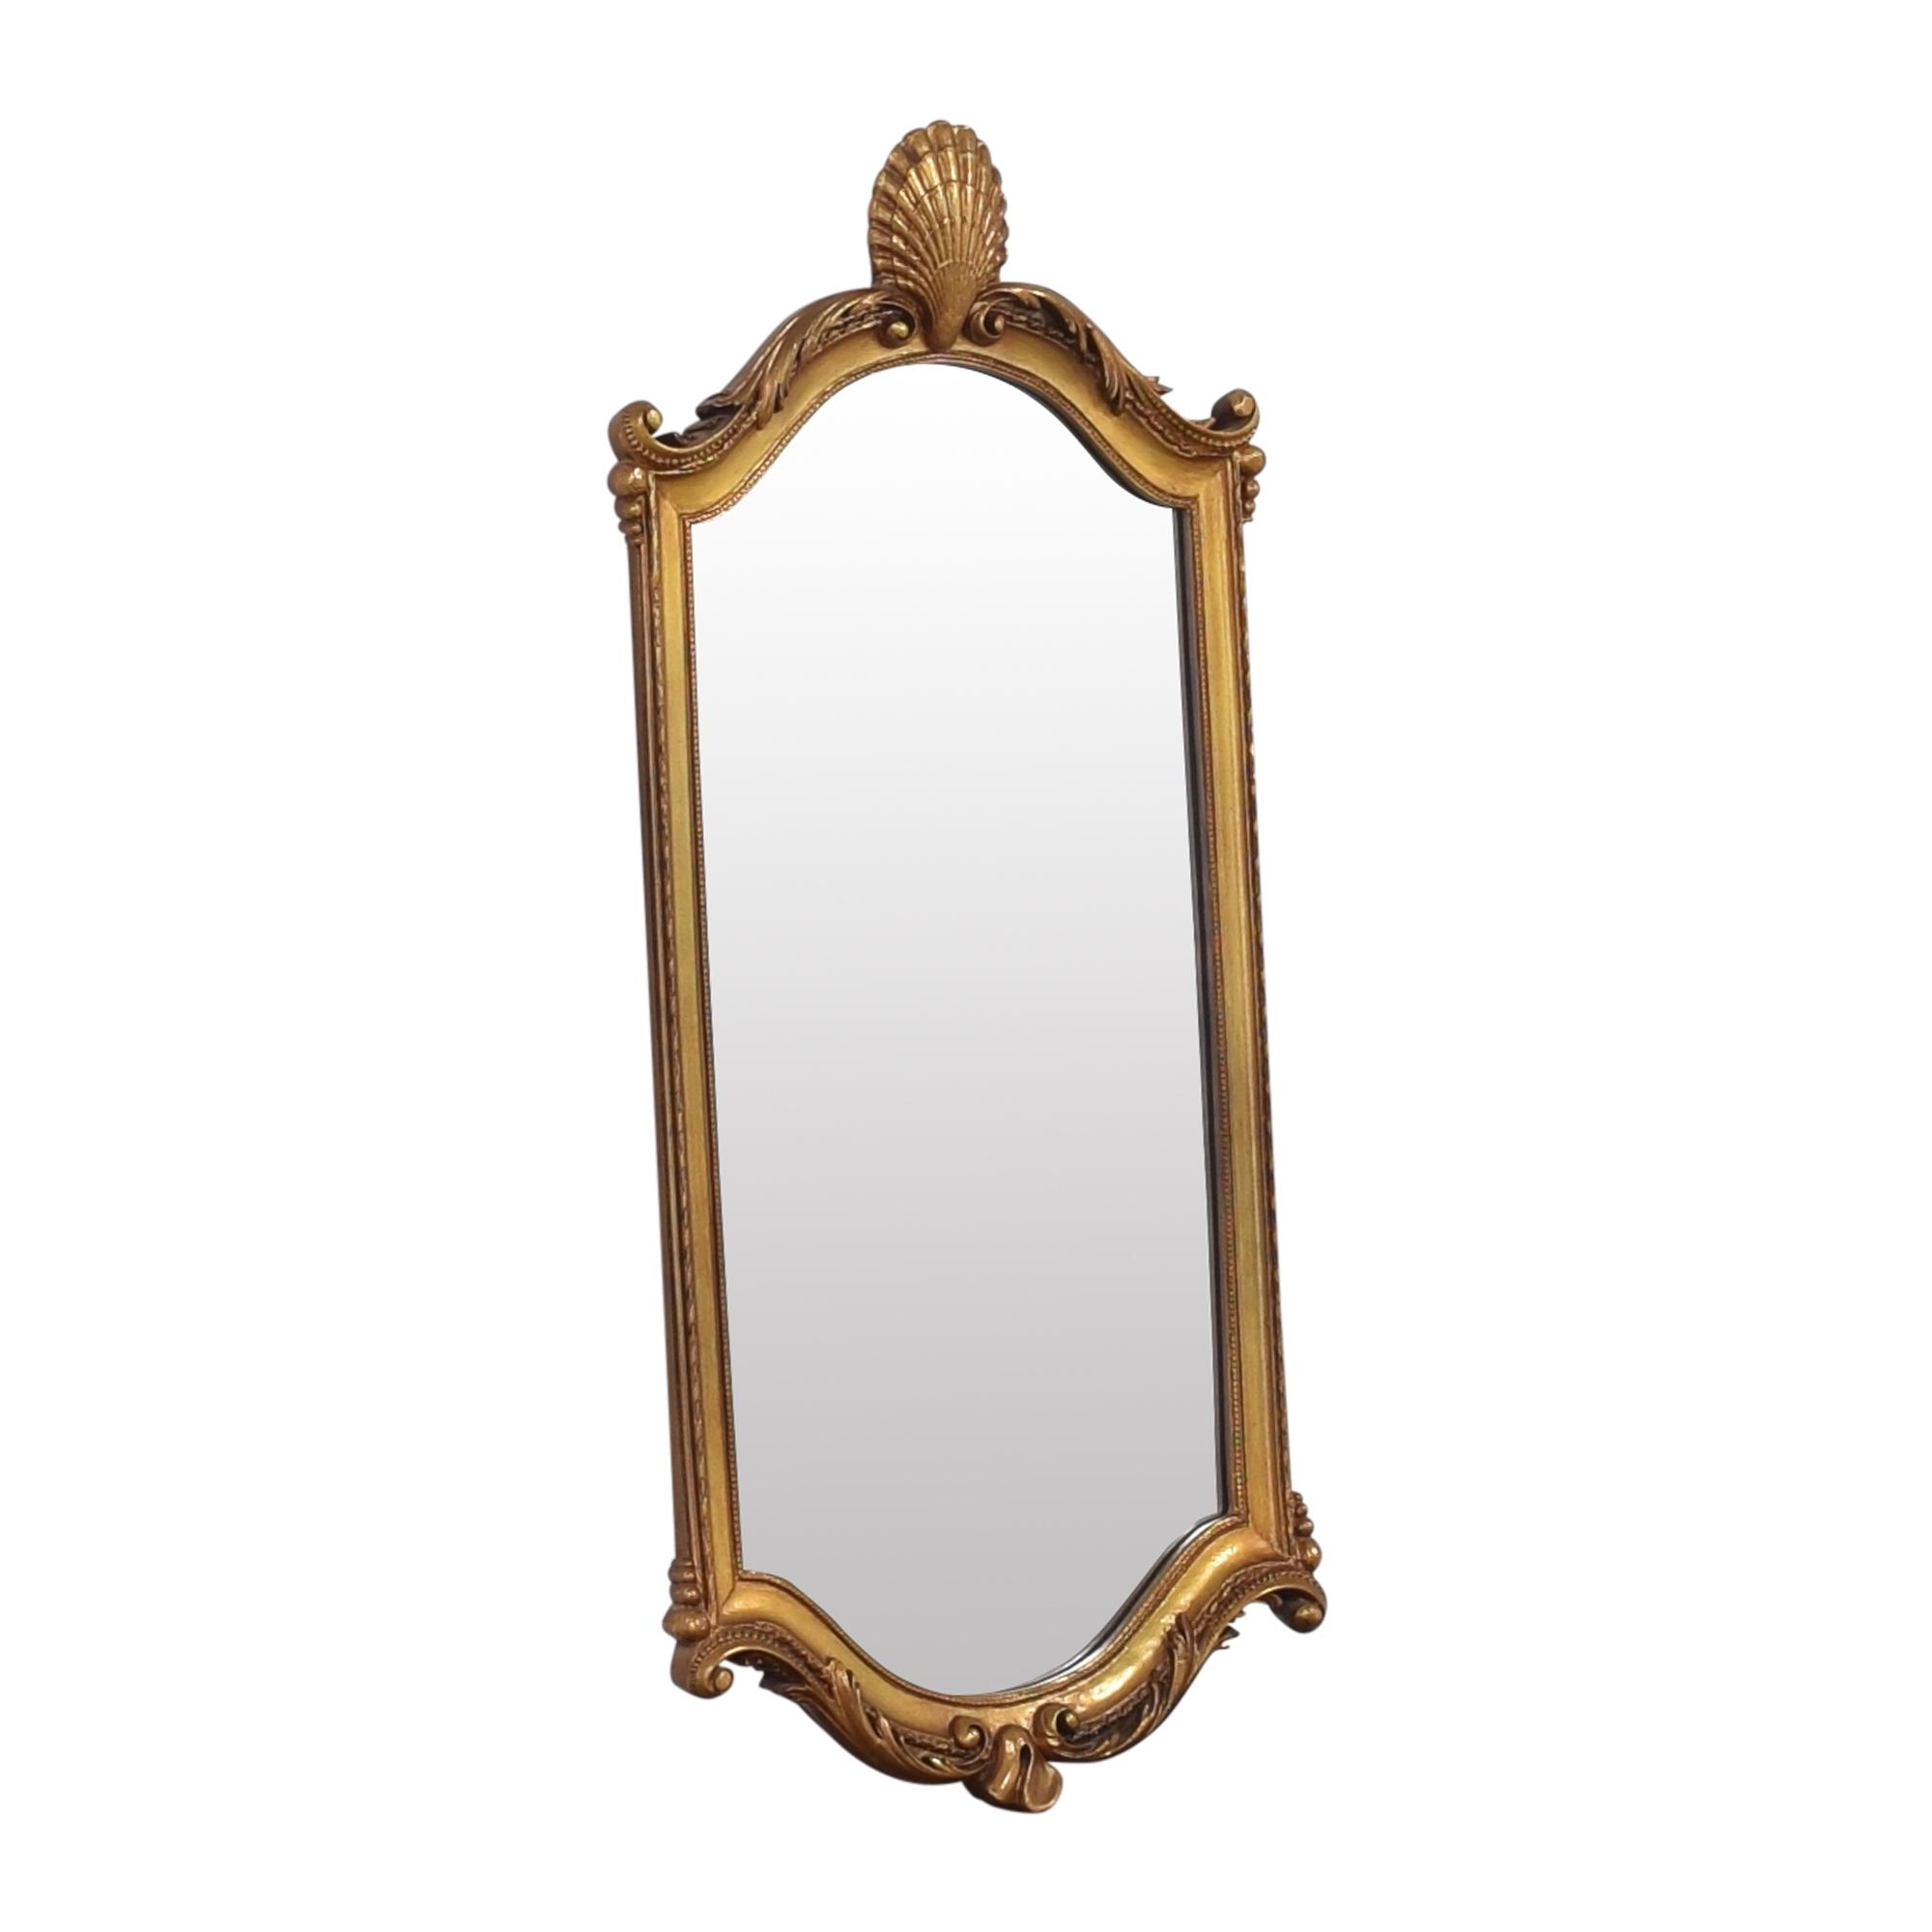 buy Ethan Allen Ethan Allen Decorative Wall Mirror online